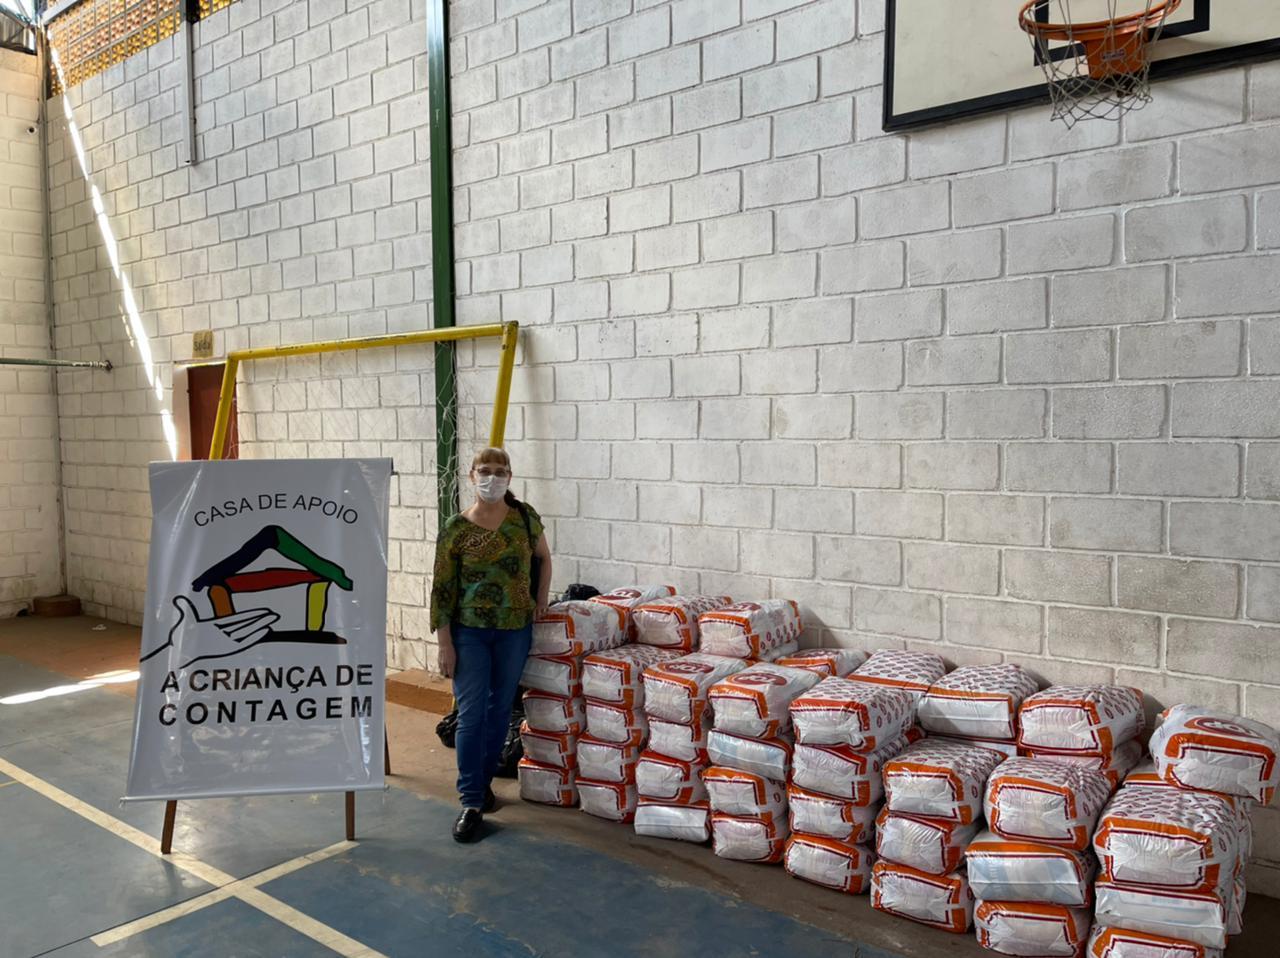 RHI Magnesita auxilia municípios e comunidades no combate à pandemia